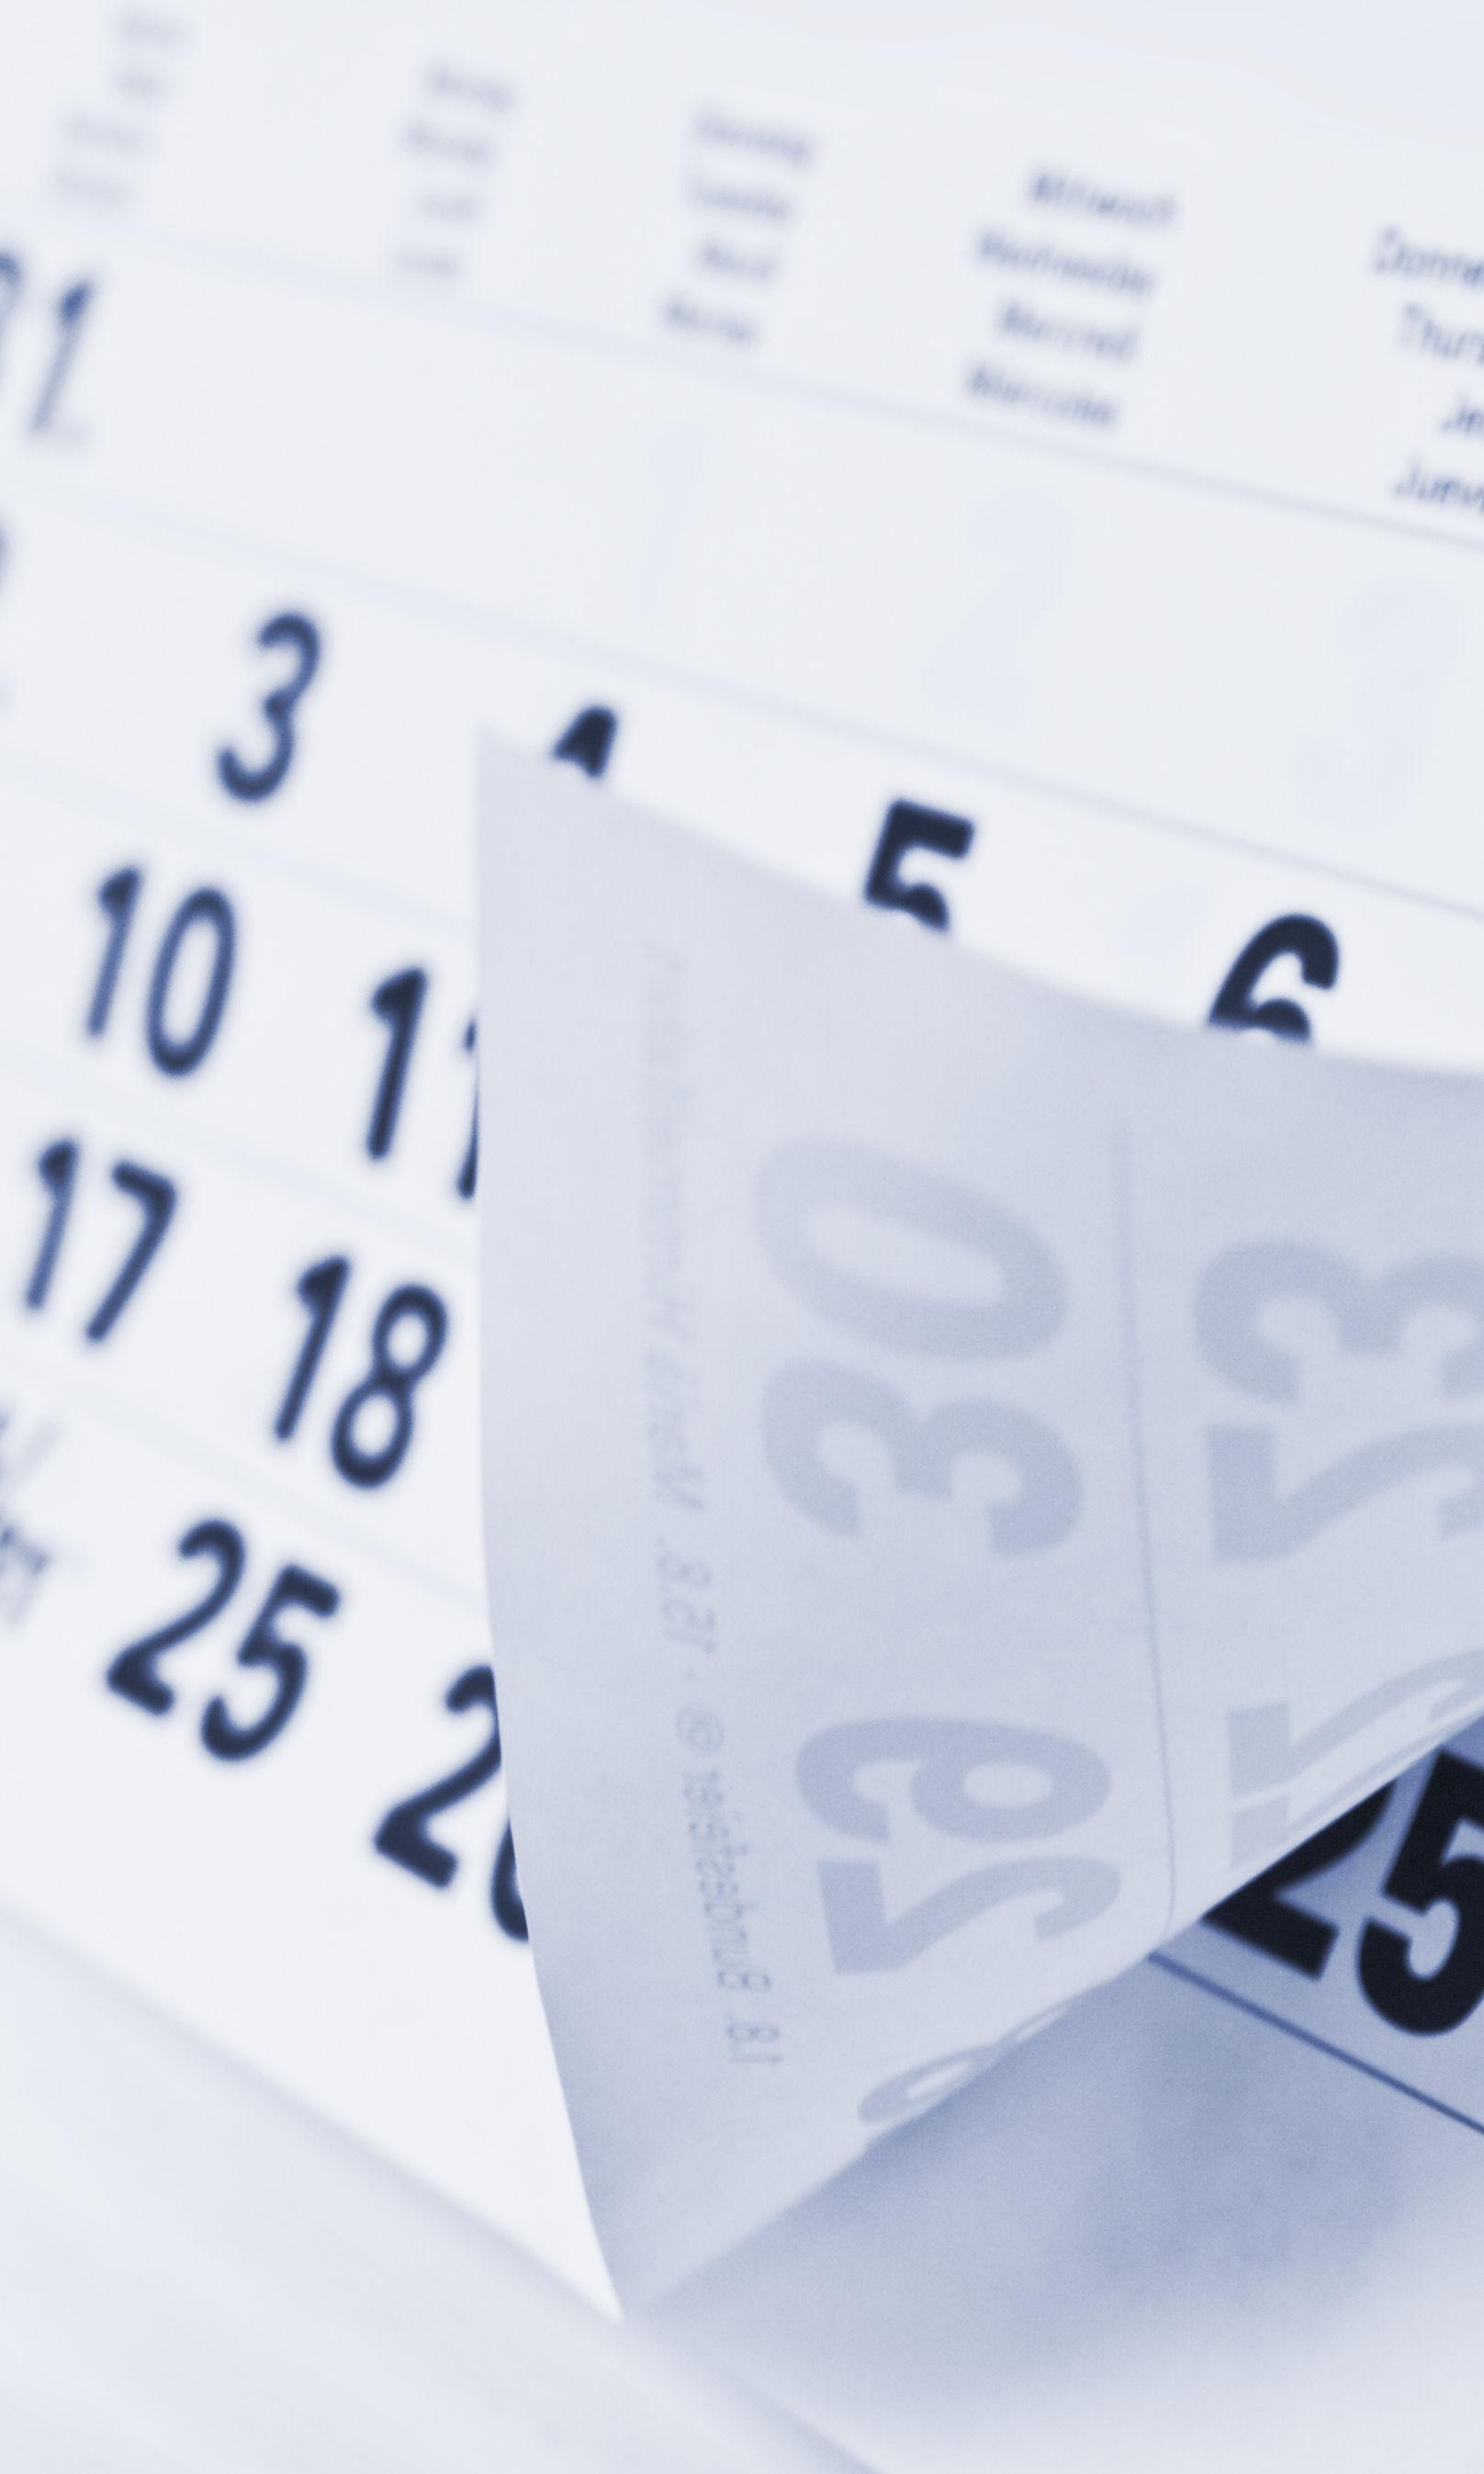 ACK Konstanz kalender